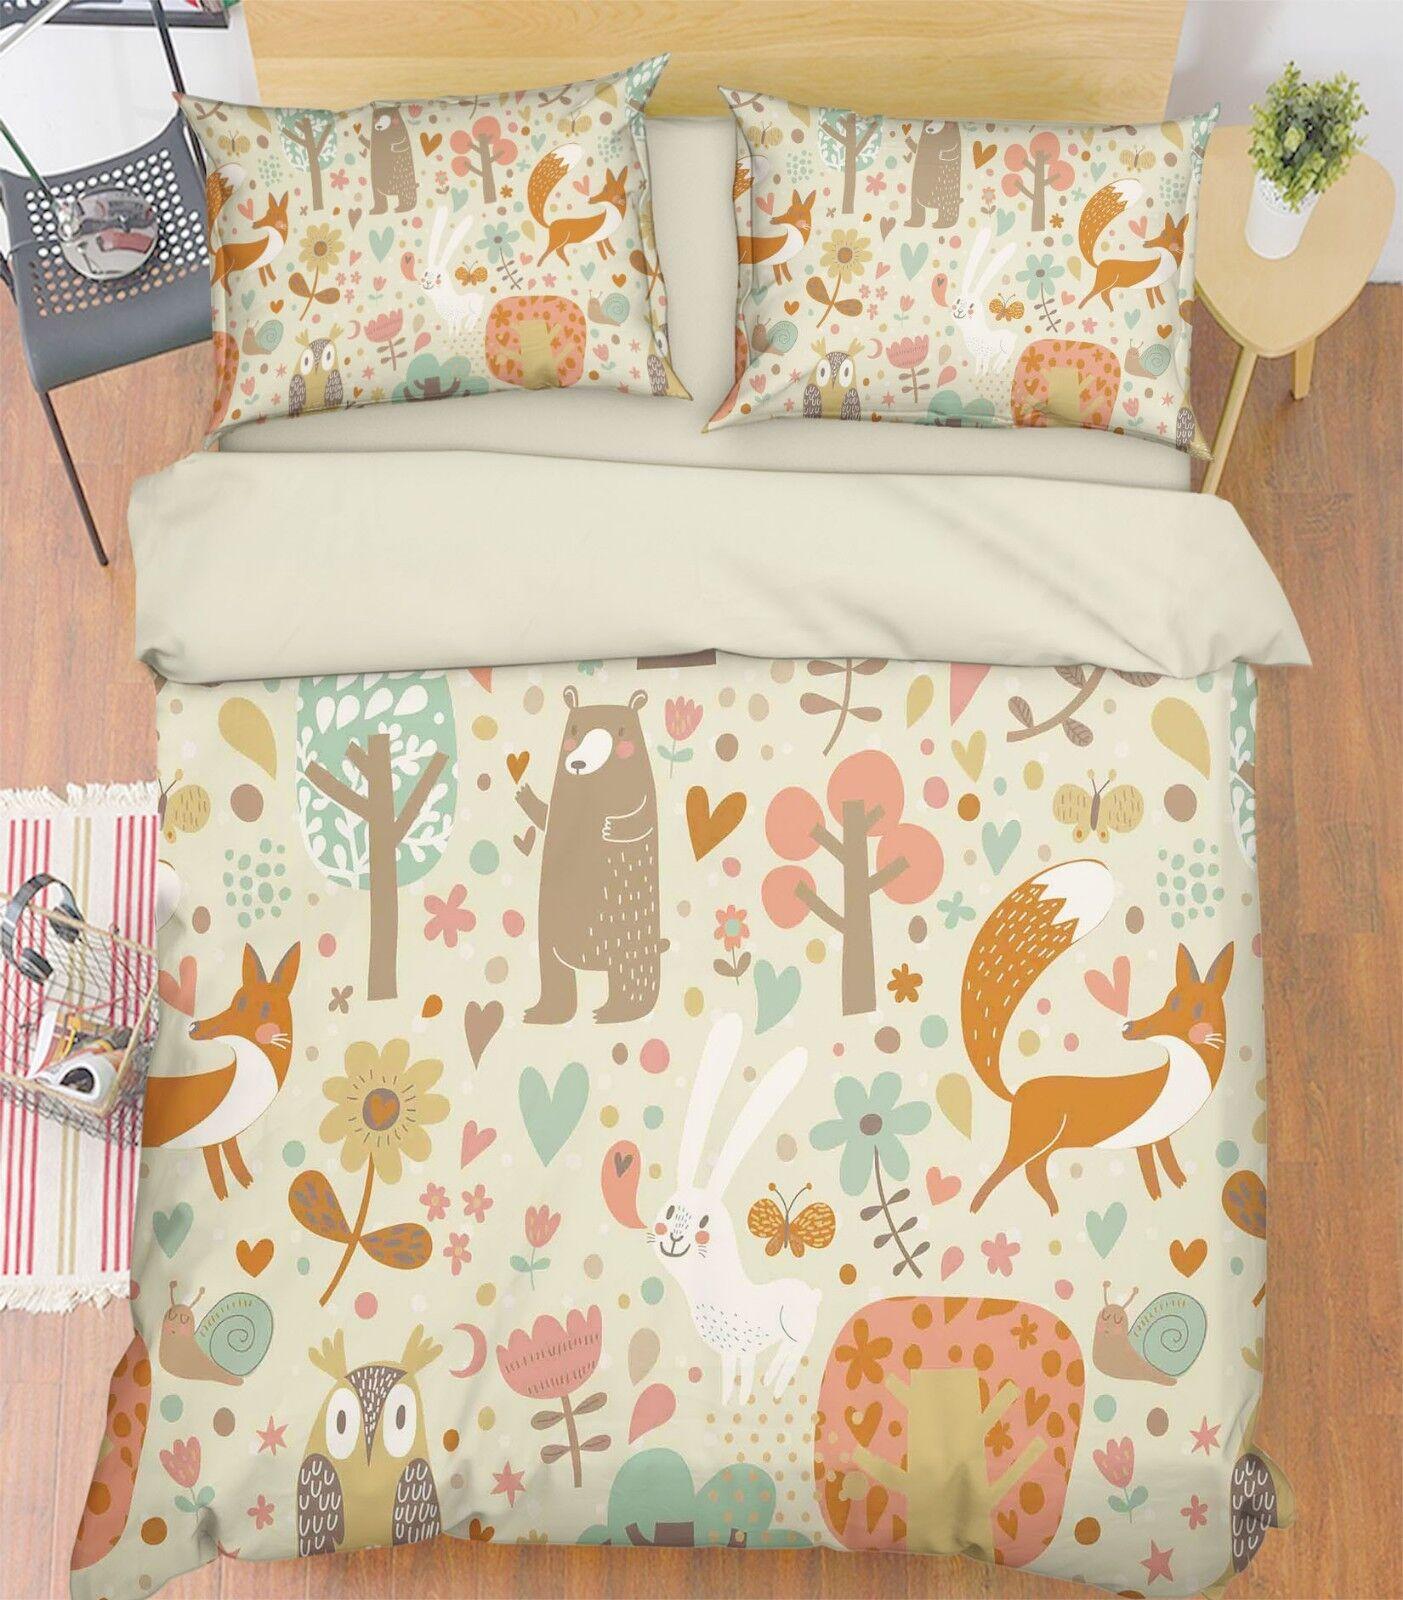 3D voituretoon Animals 93 Bed PilFaiblecases Quilt Duvet Cover Set Single Queen King CA